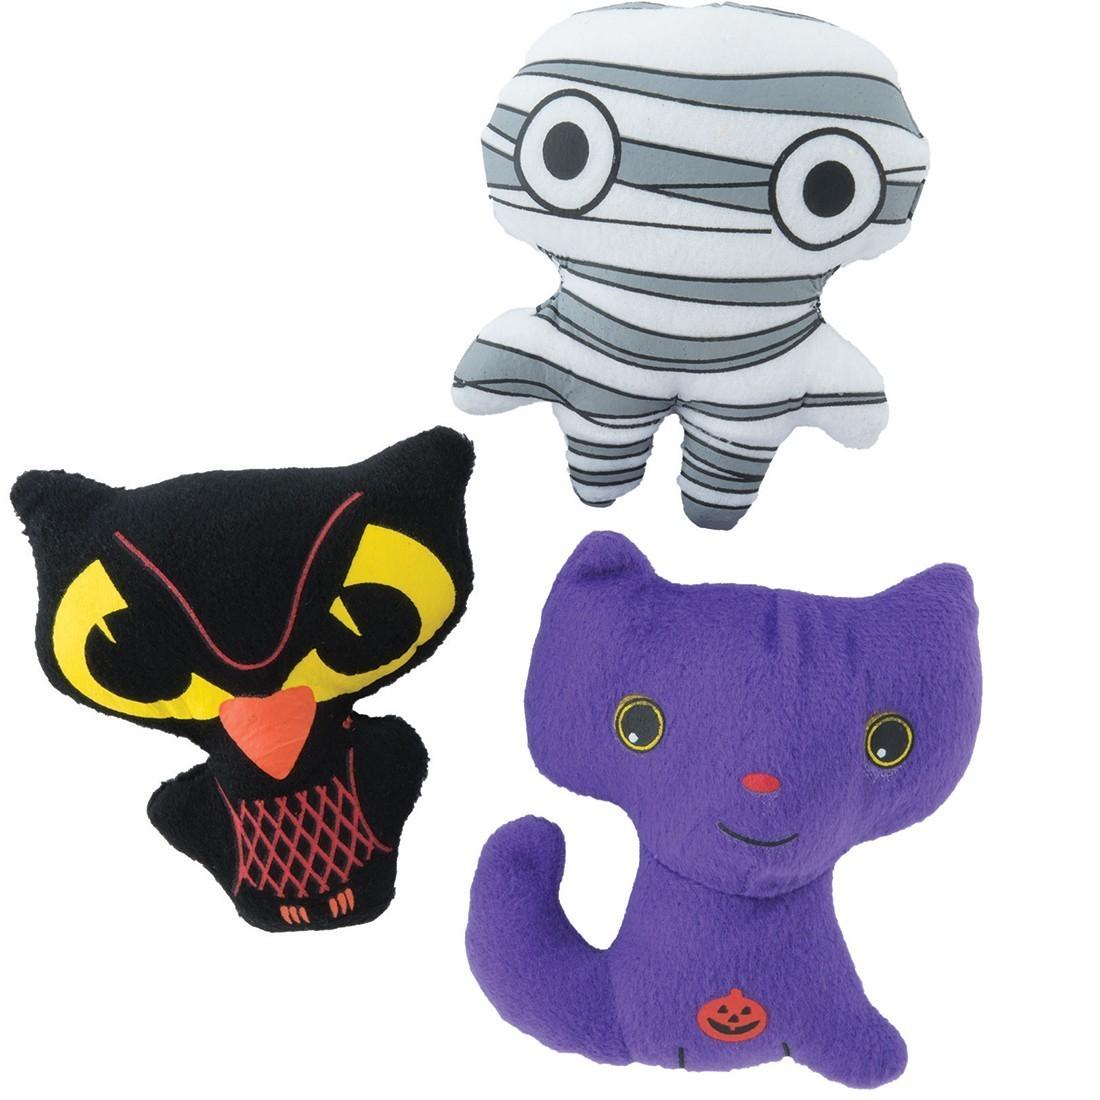 Plush Halloween Mini Pillow Characters [image]